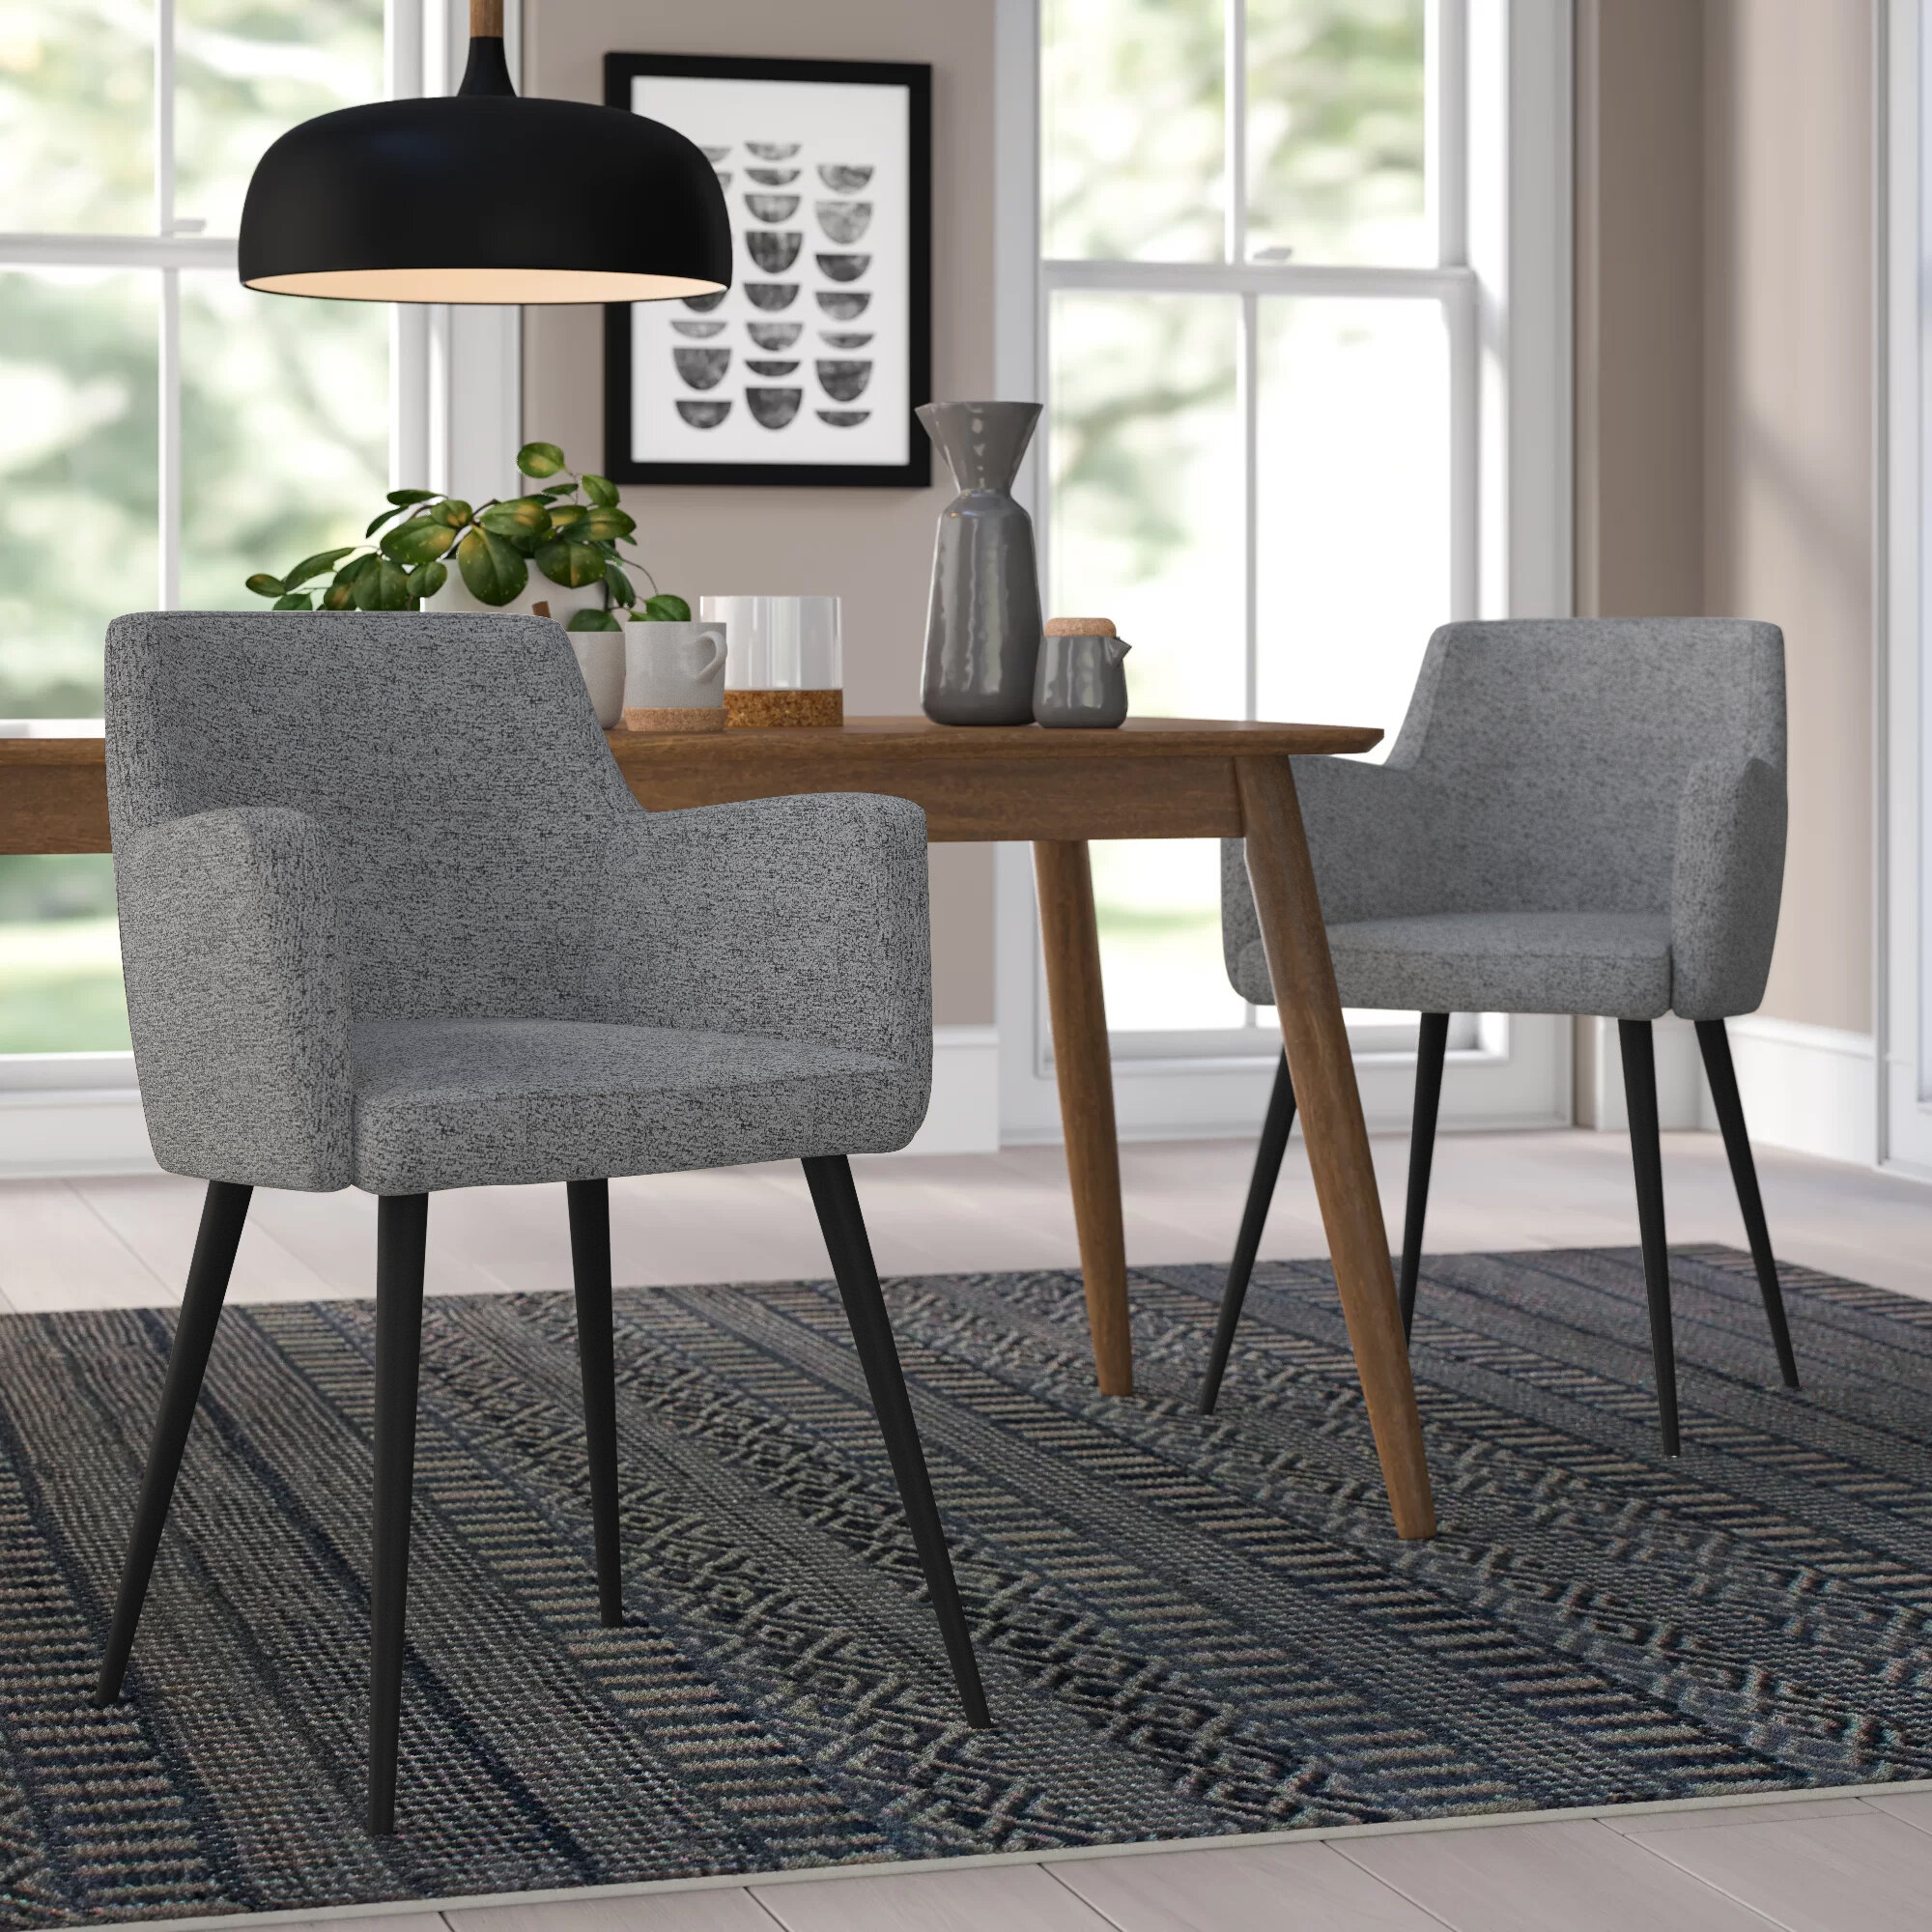 "Green Spotted Design /""Flecks/"" Chenille Heavy Upholstery Fabric"